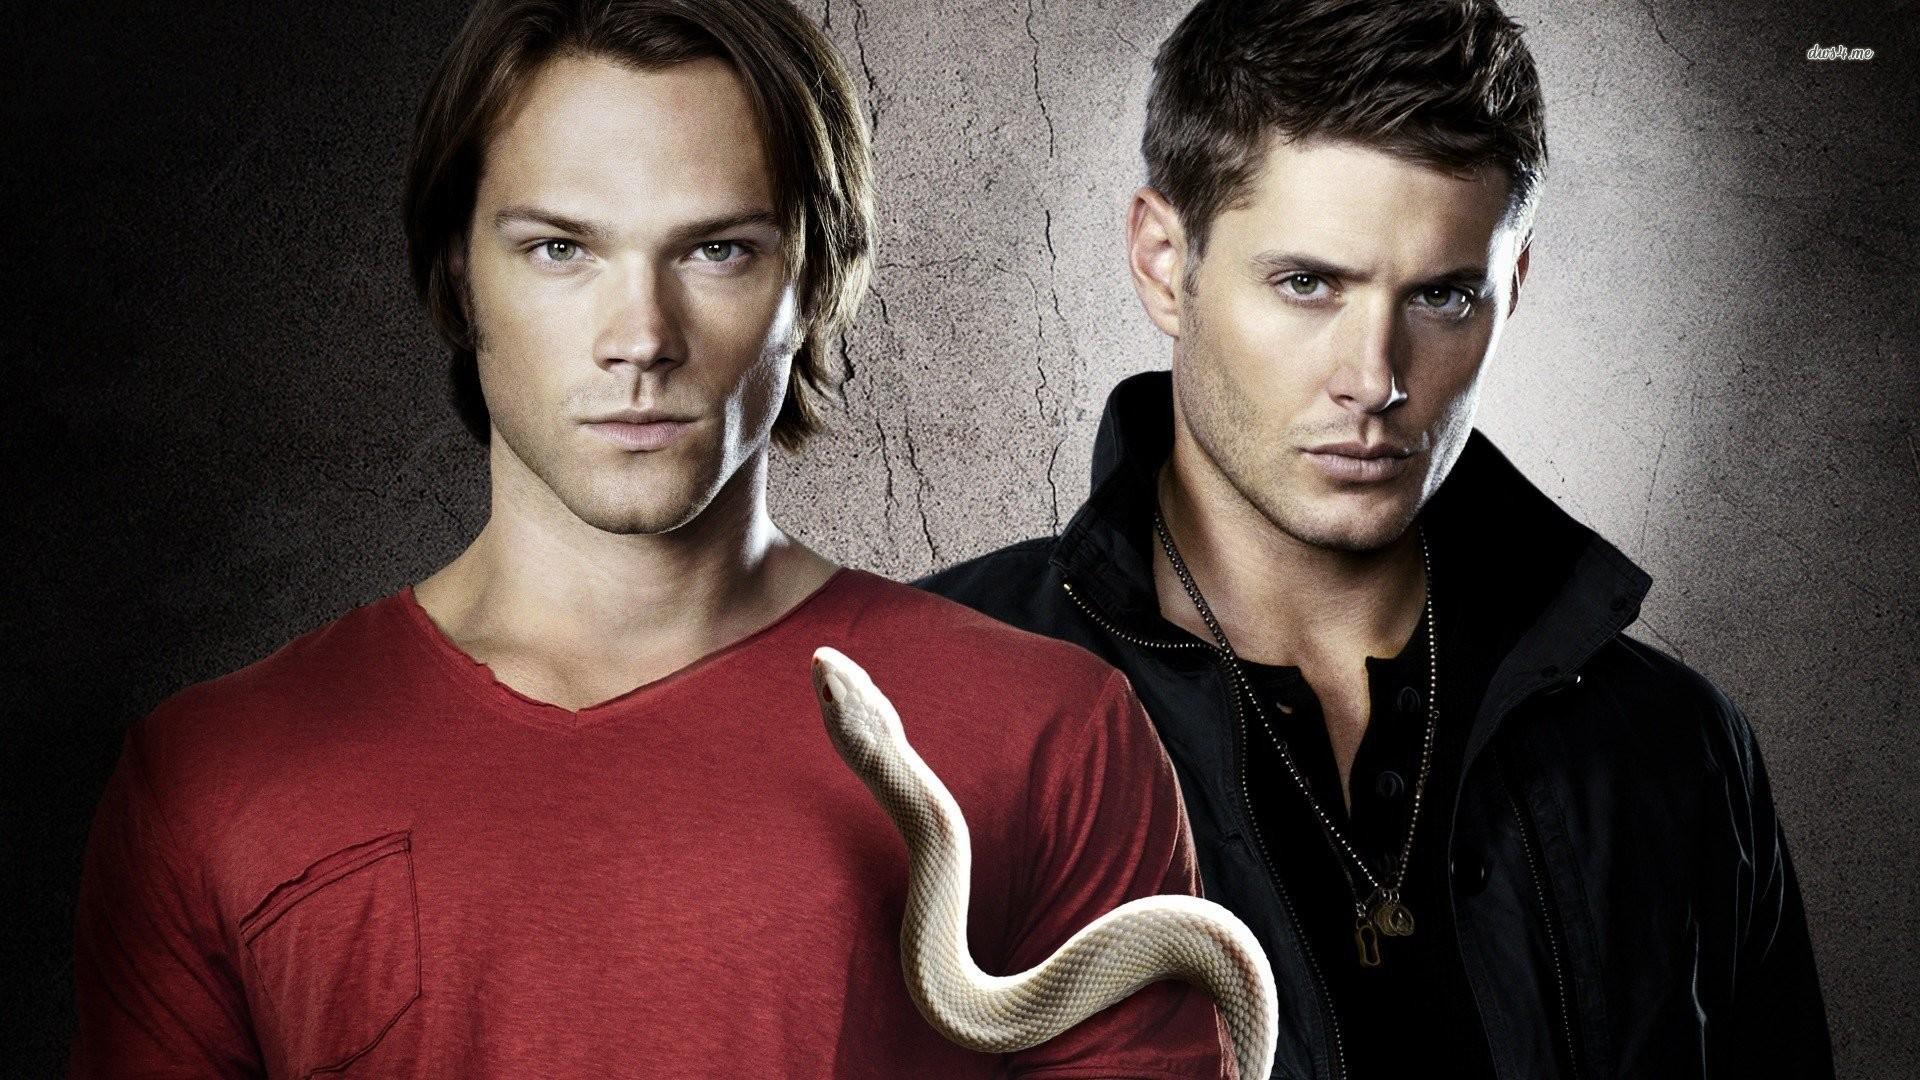 Sam And Dean Winchester – Supernatural 541459